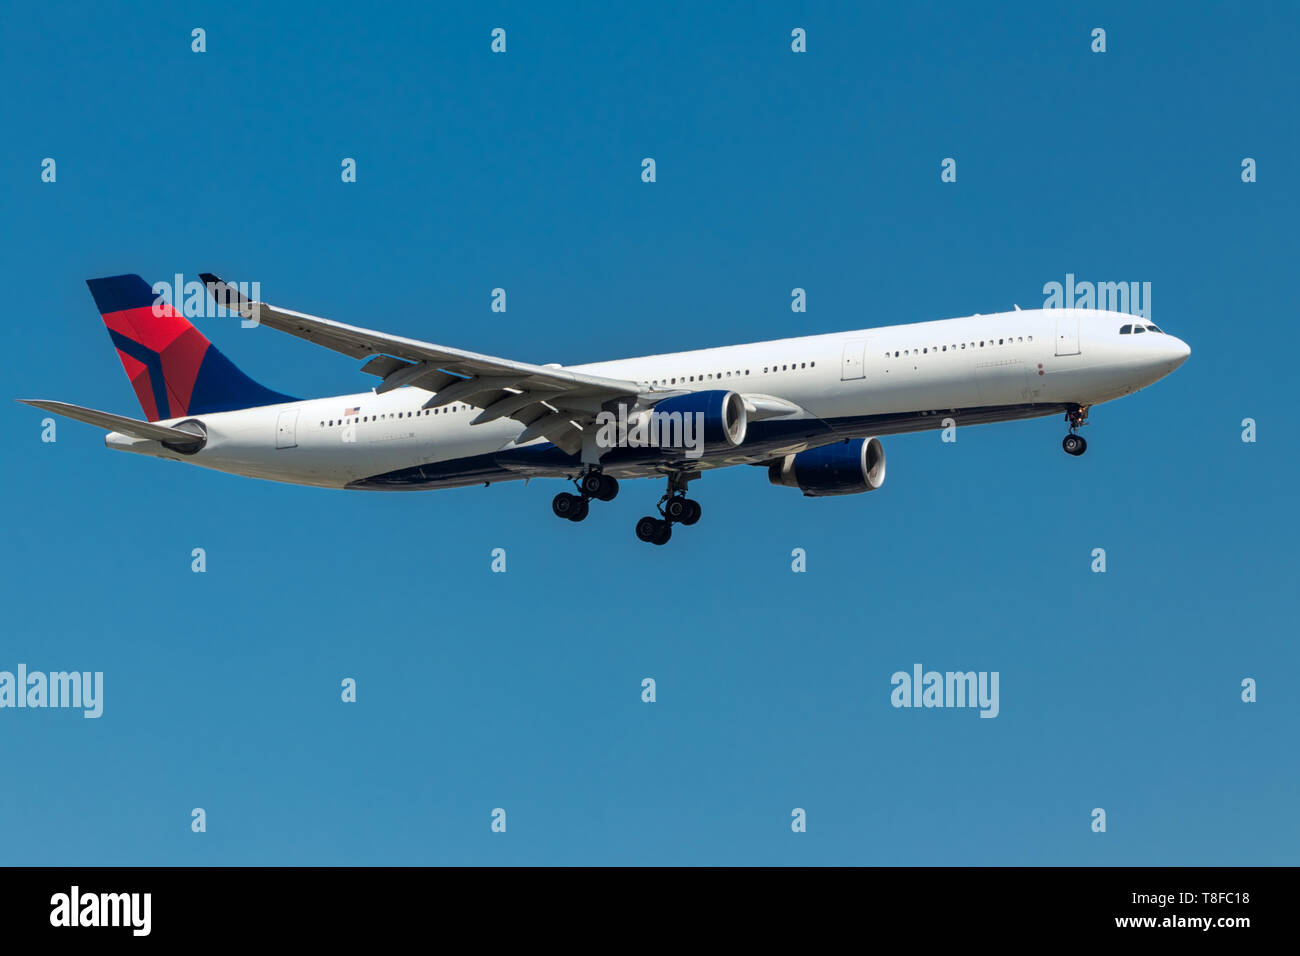 Generische Flugzeug im Flug Stockbild